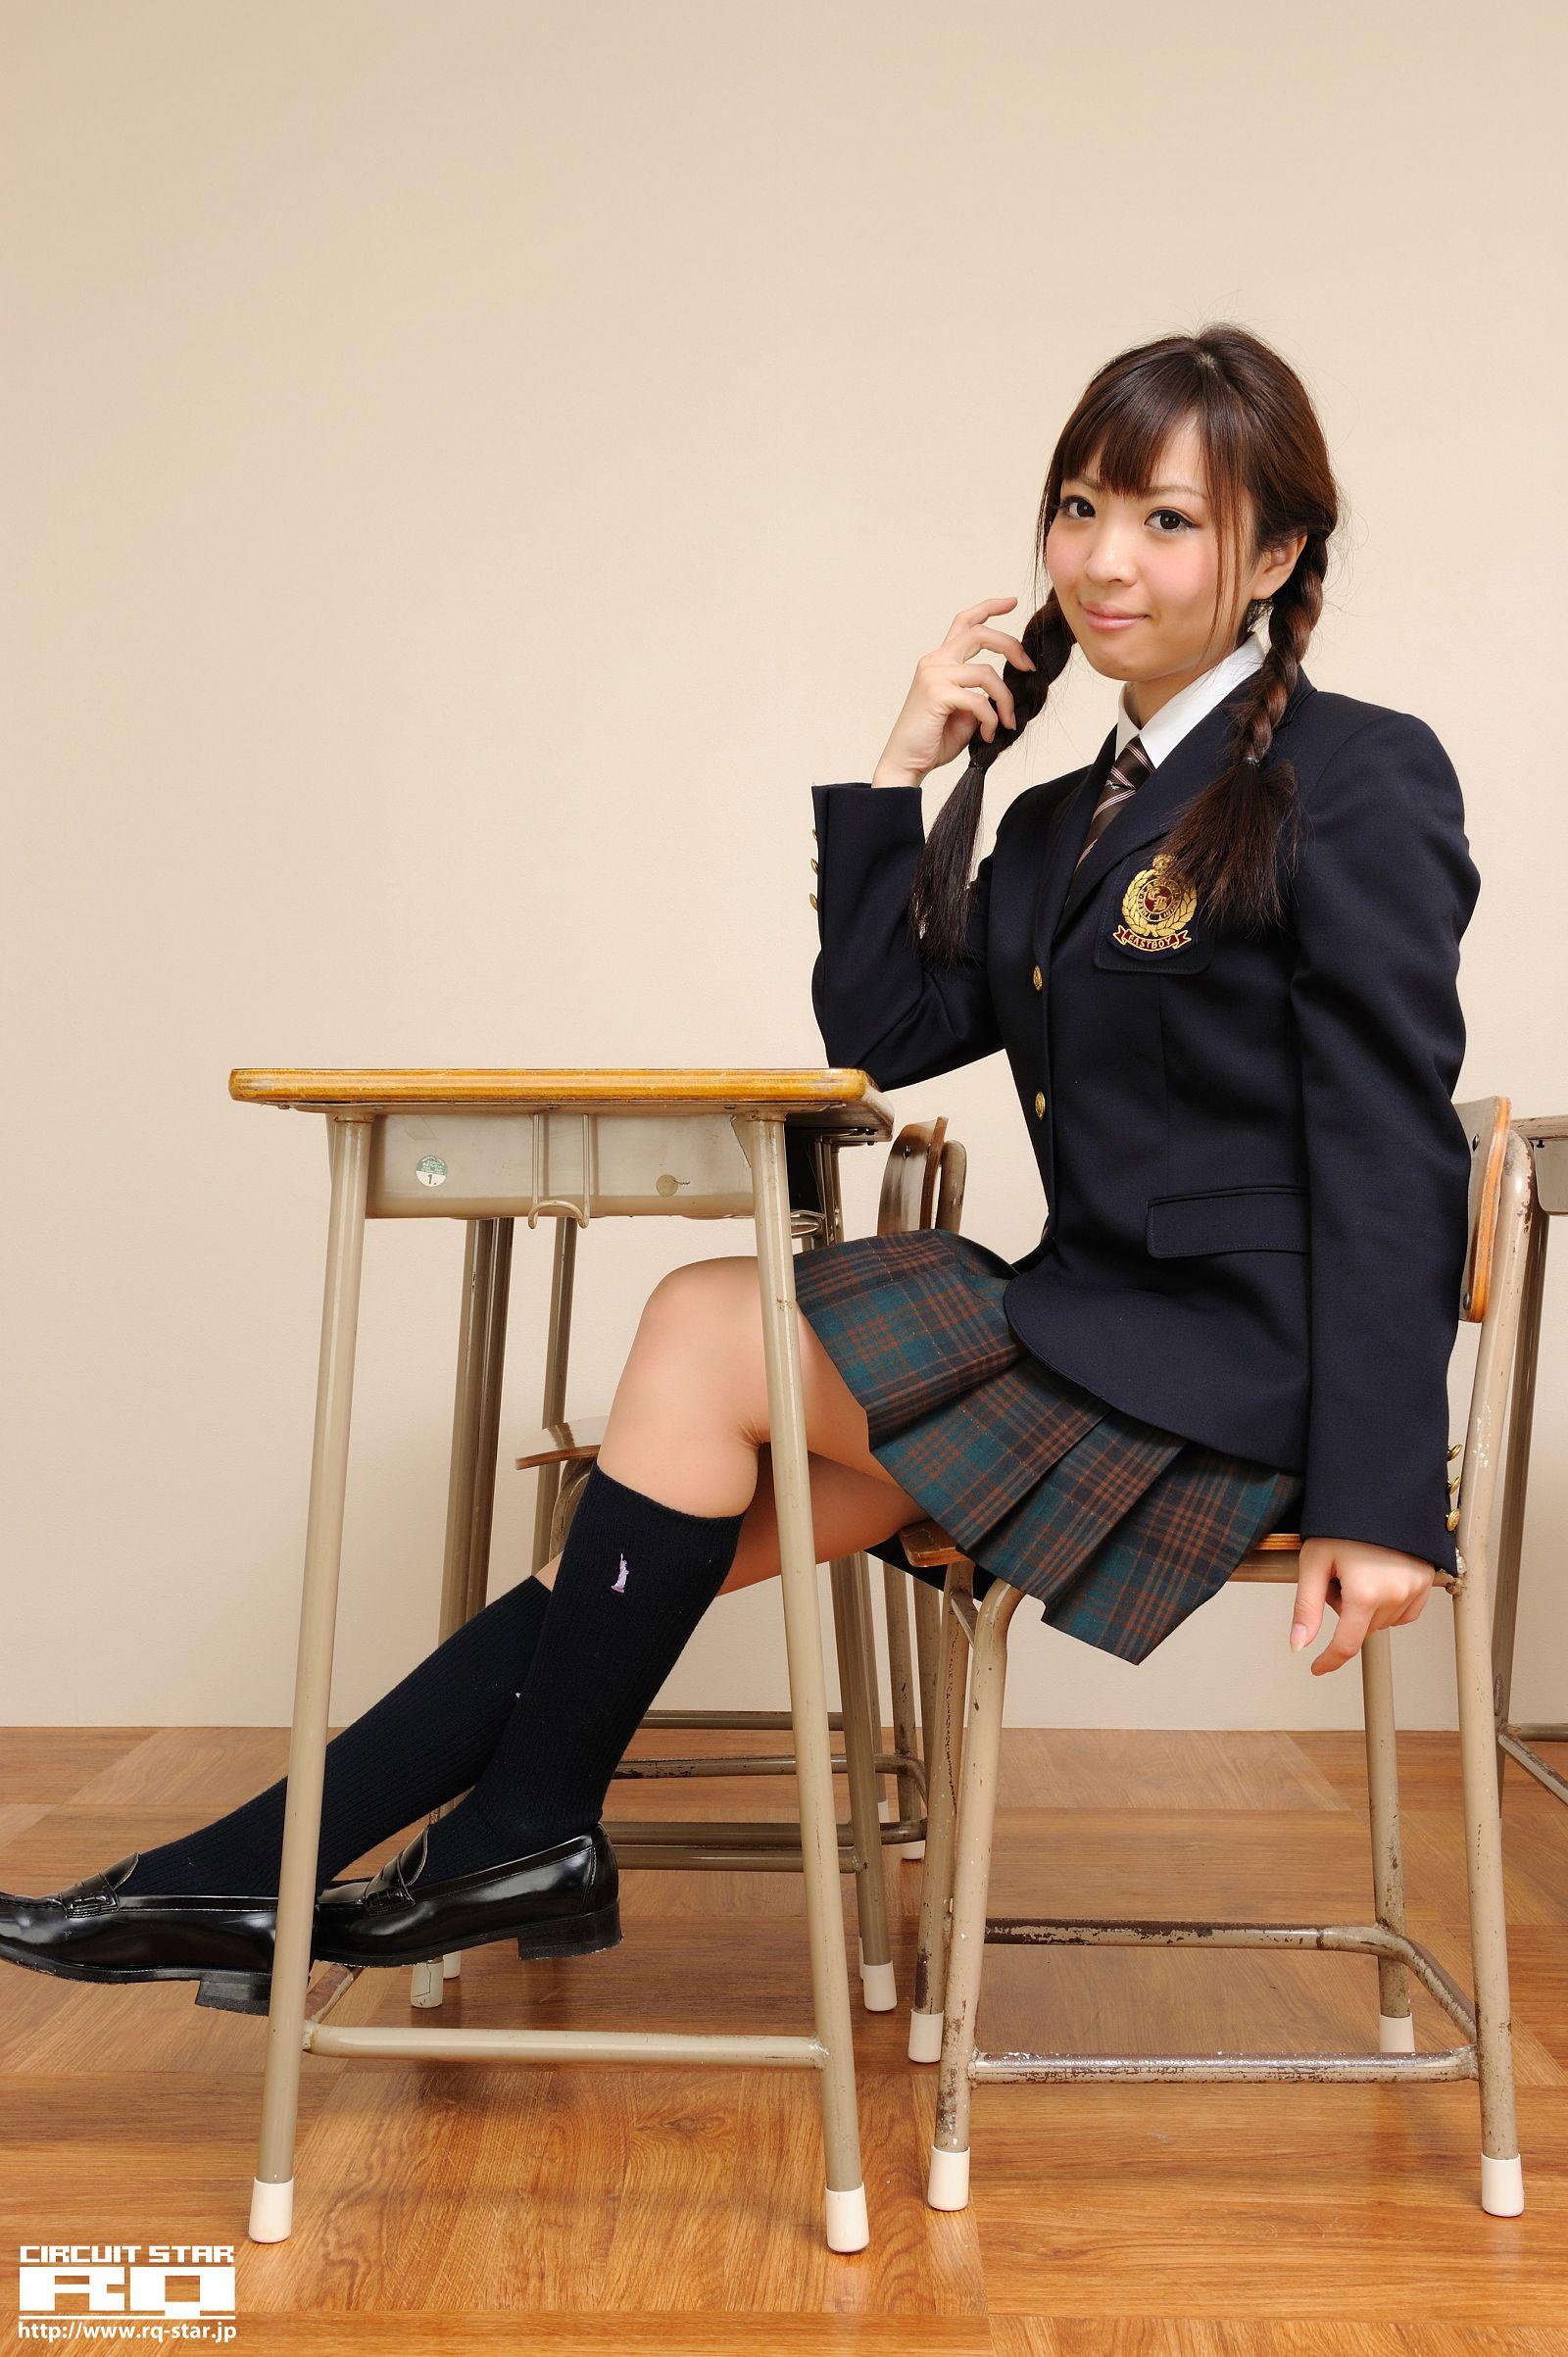 [RQ STAR美女] NO.00515 Mayuka Kuroda 锿蚪Y花 Student Style[111P] RQ STAR 第1张